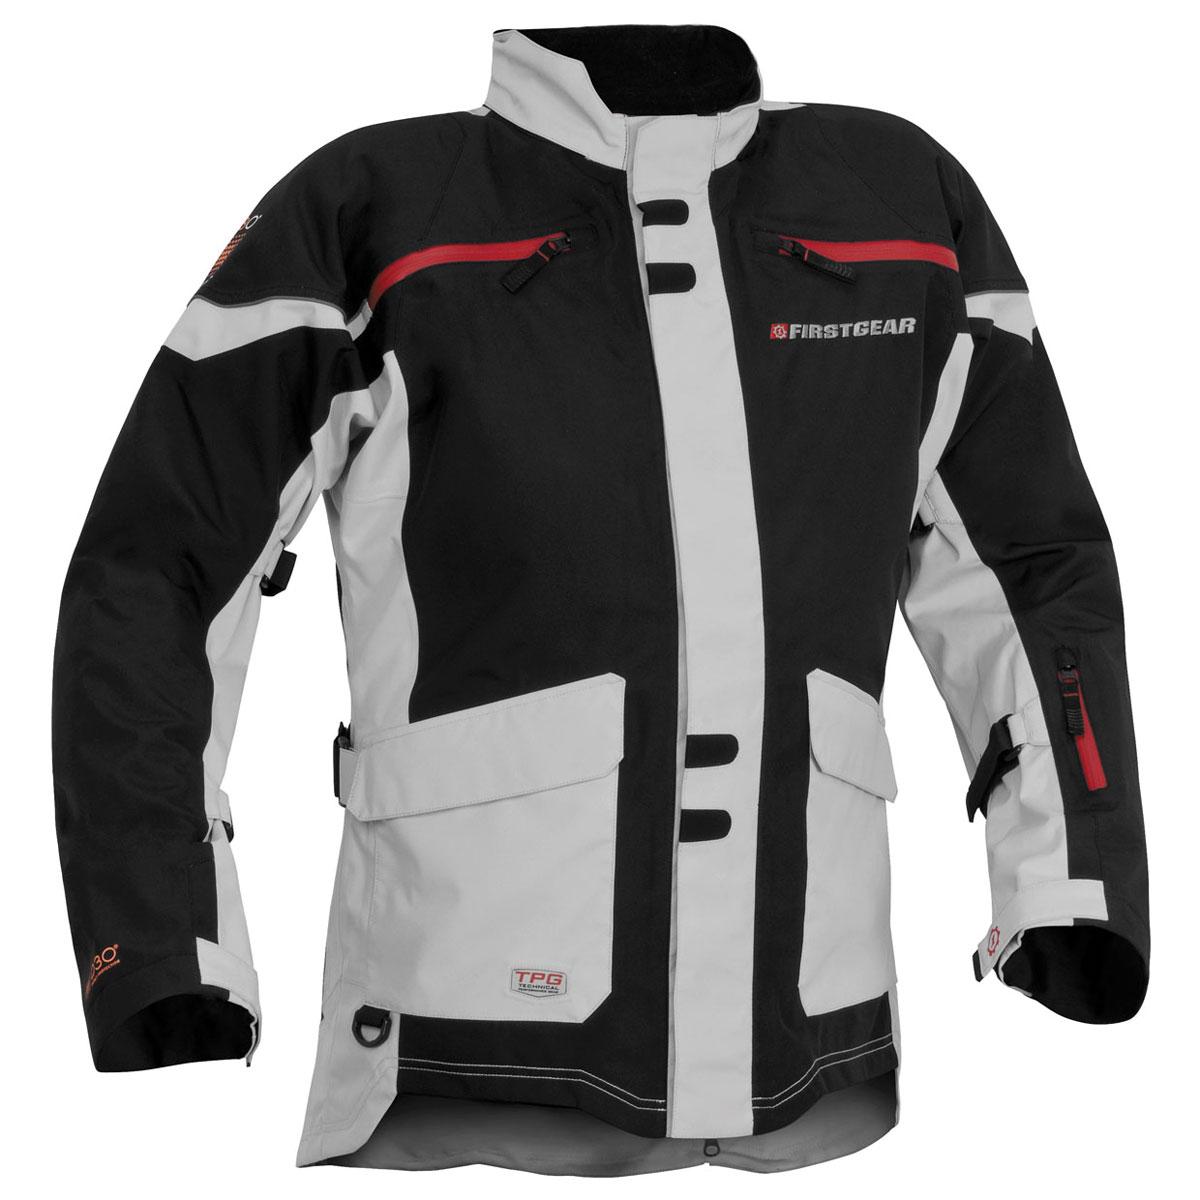 Firstgear Men's TPG Rainier Black/Silver Jacket